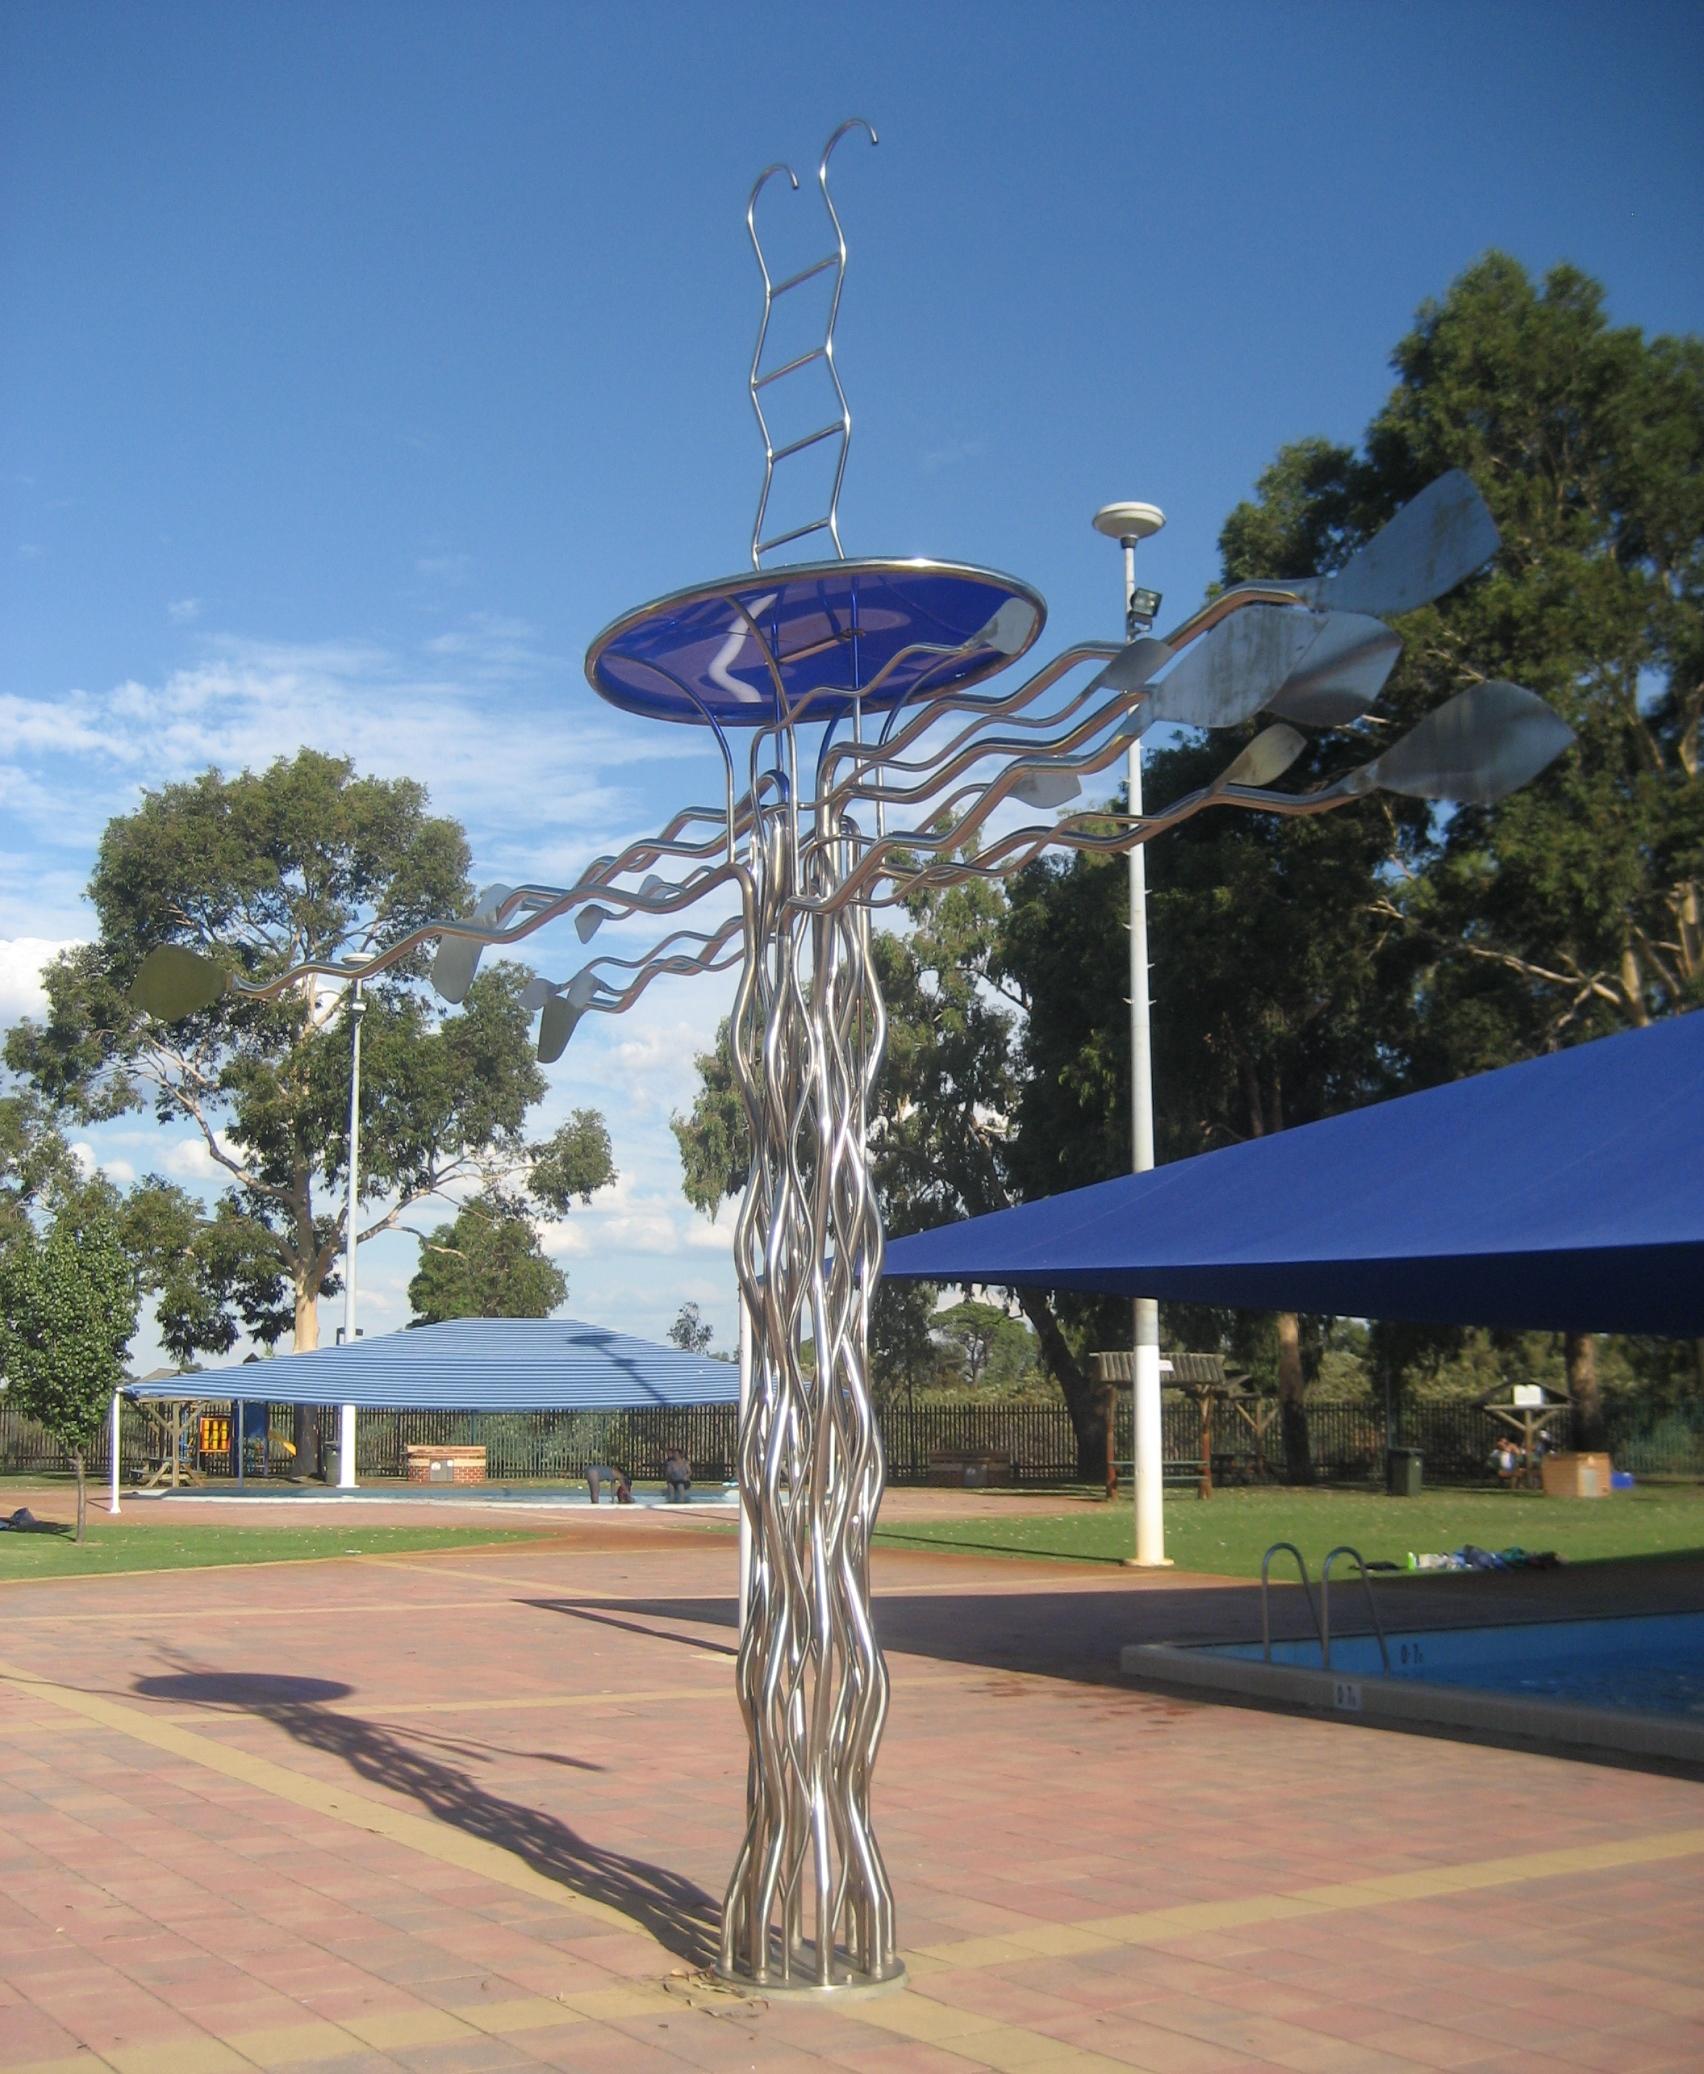 California dates in Perth